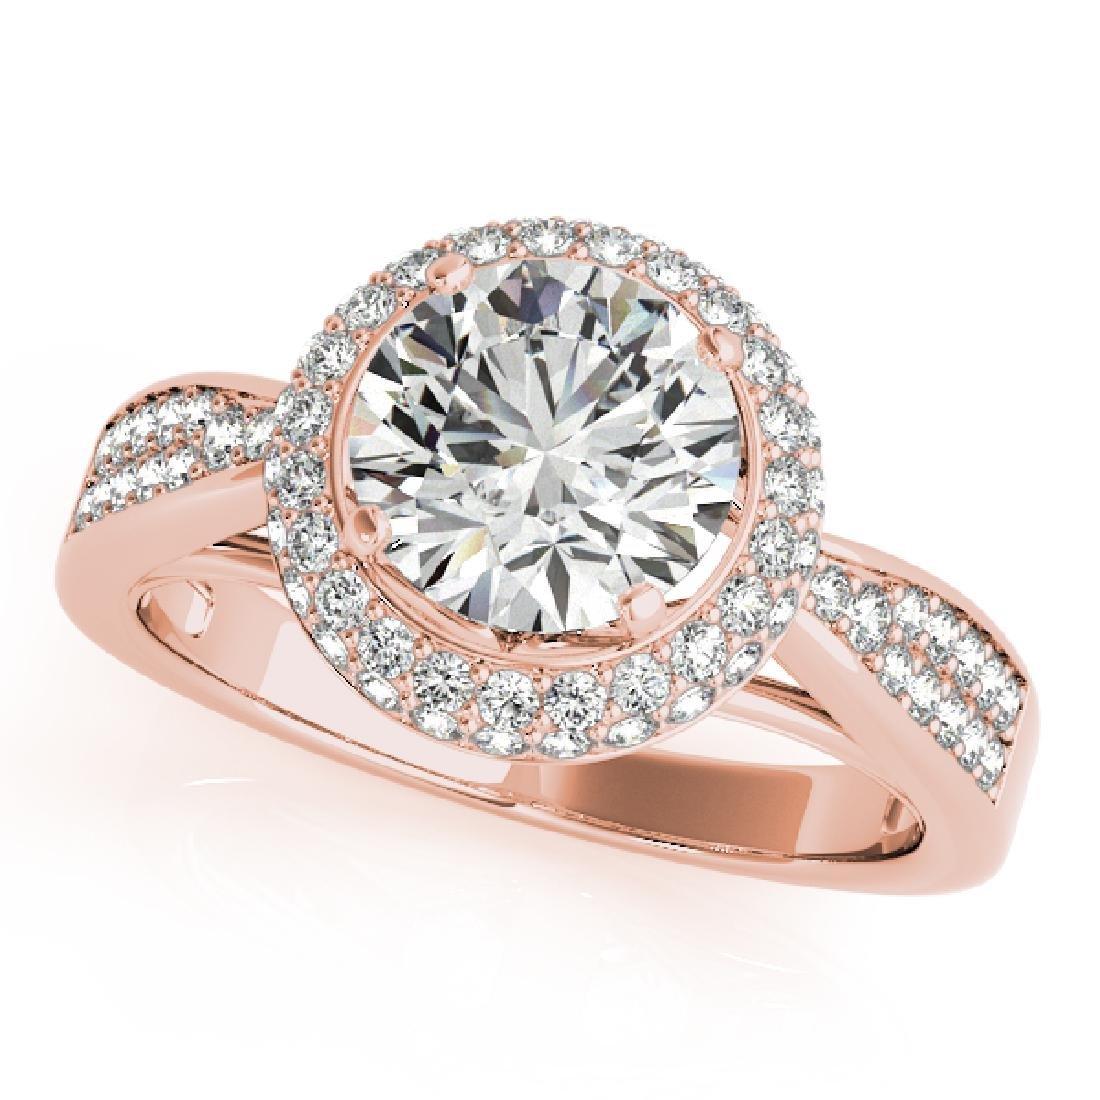 CERTIFIED 18K ROSE GOLD 0.86 CT G-H/VS-SI1 DIAMOND HALO